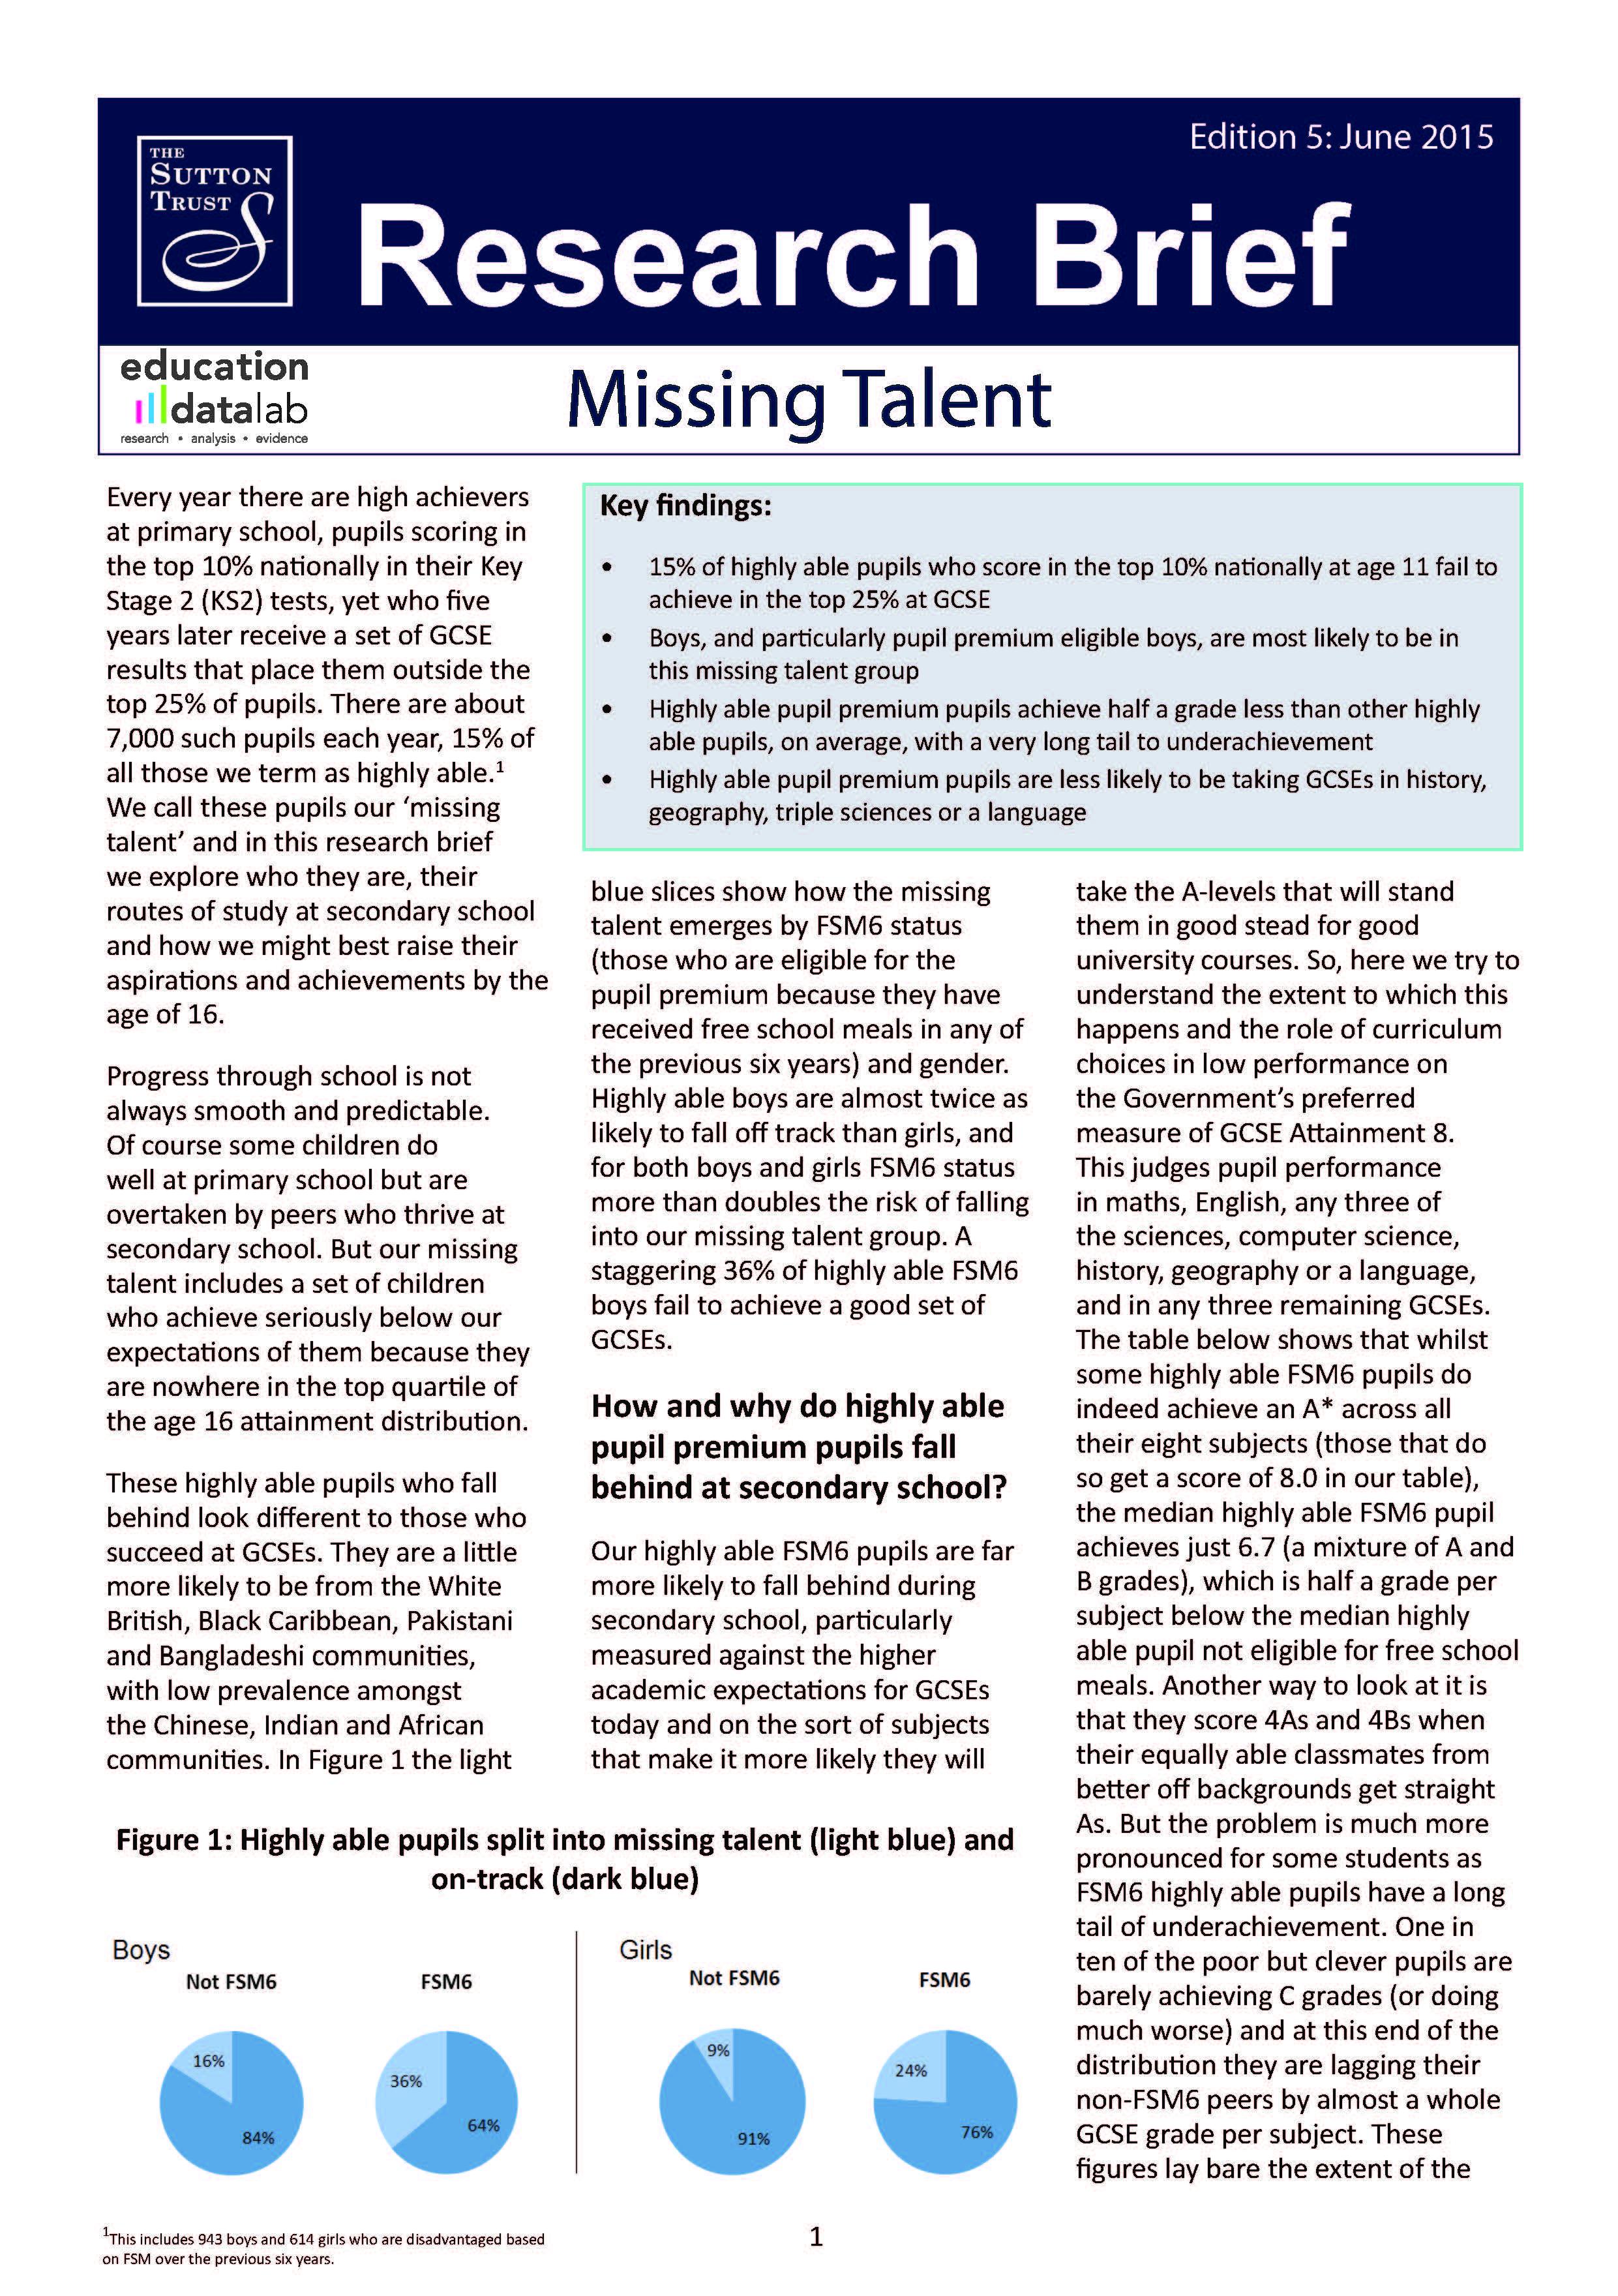 Missing Talent